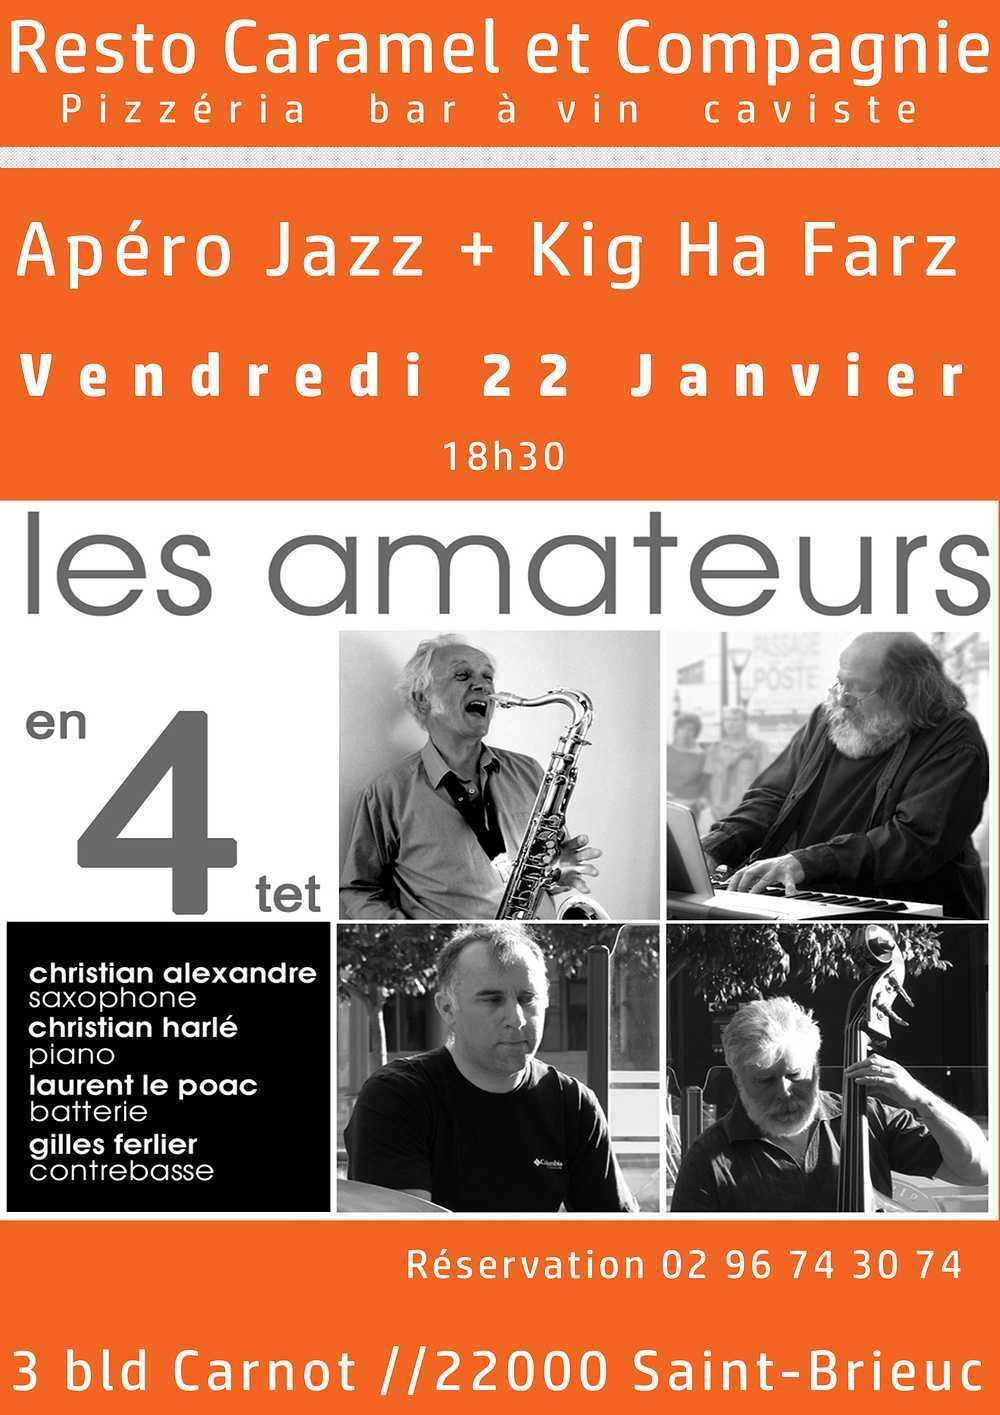 Apéro jazz et Kig Ha Farz le 22 janvier 0